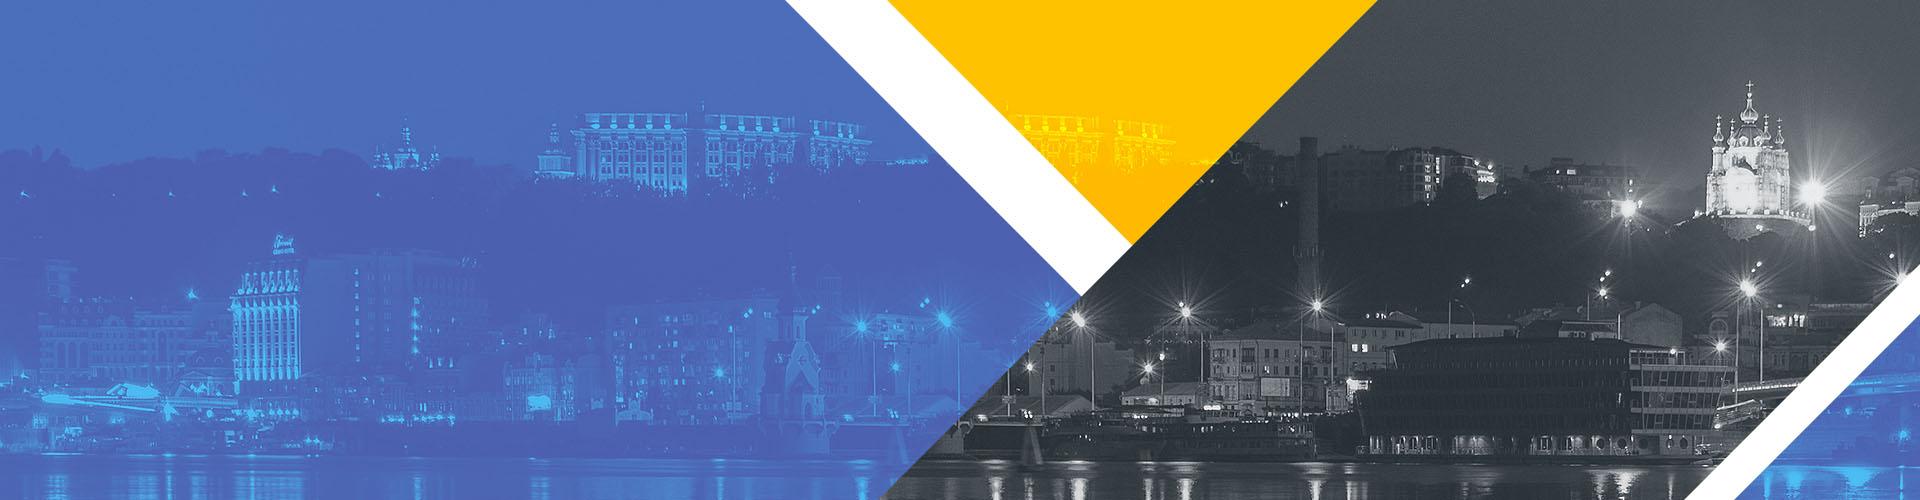 ukraine-banner-bg